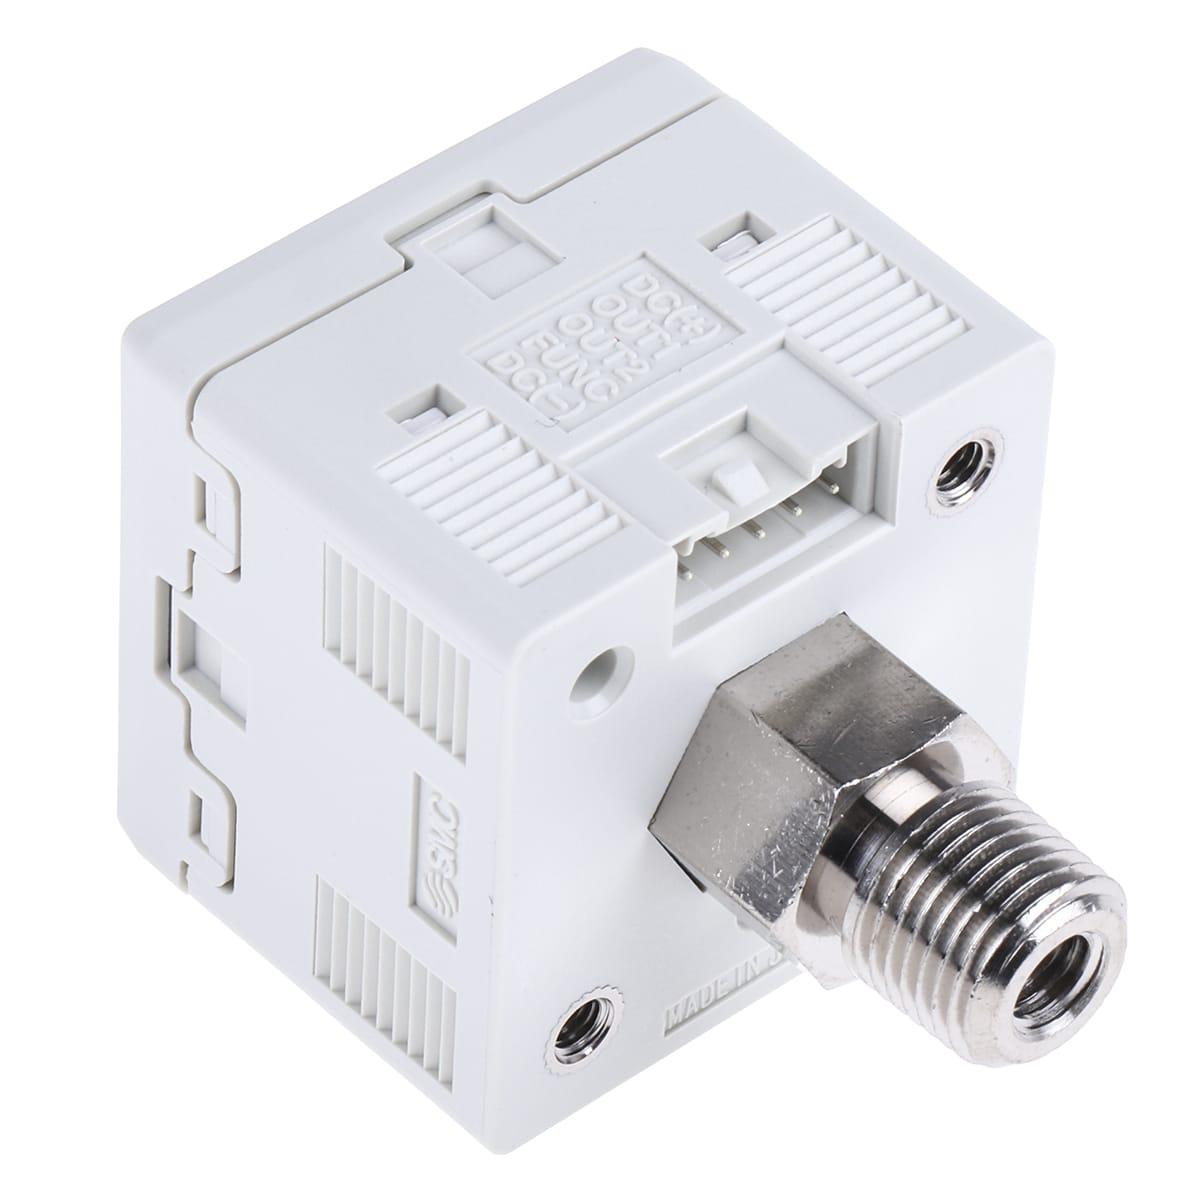 1/8 Inch Pressure Switch